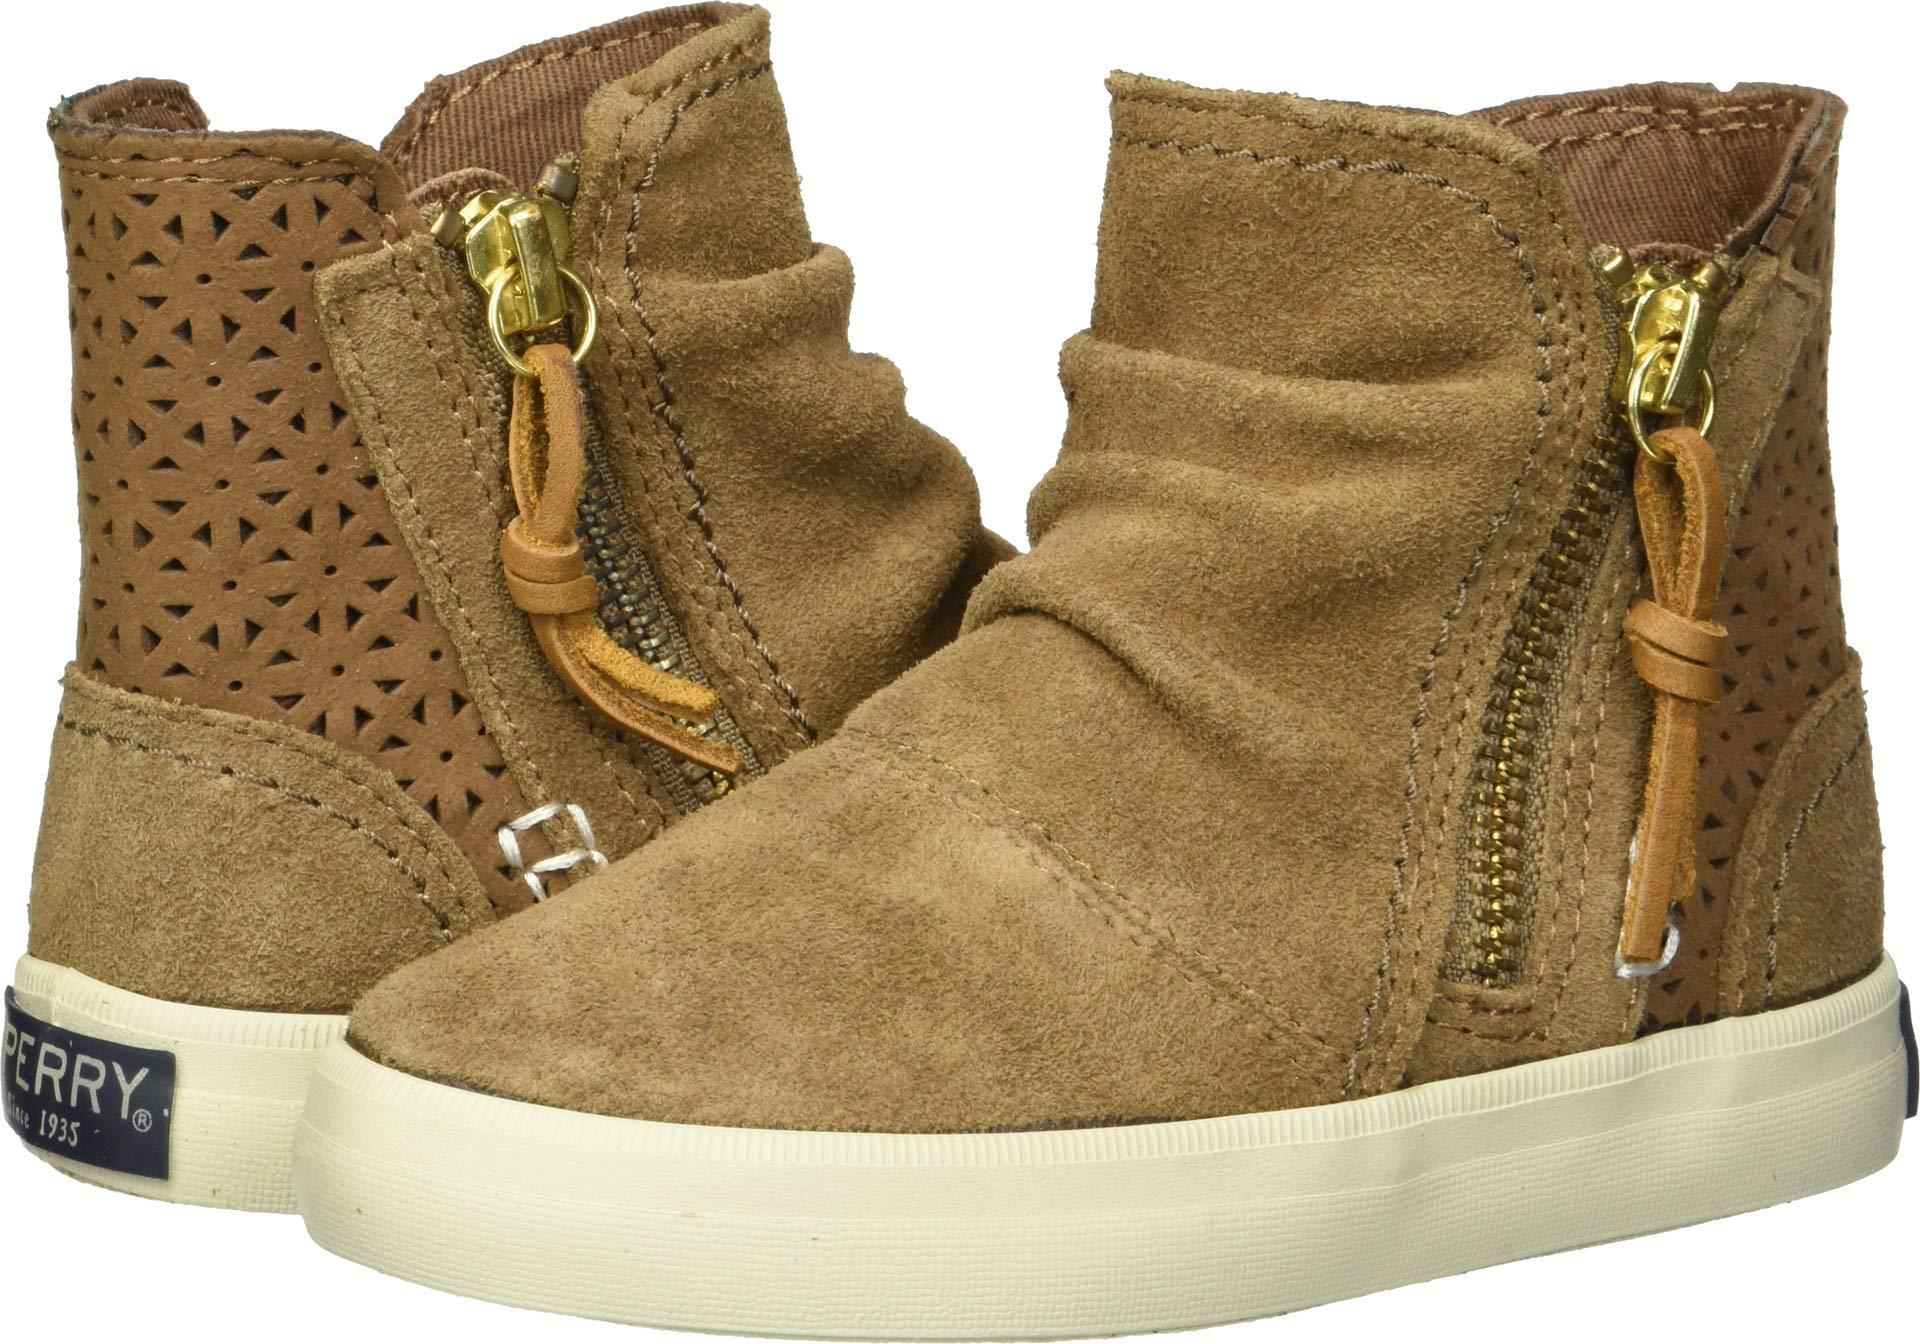 Sperry Top-Sider Girls' Crest Zone Sneaker, Chestnut, 9 Medium US Toddler